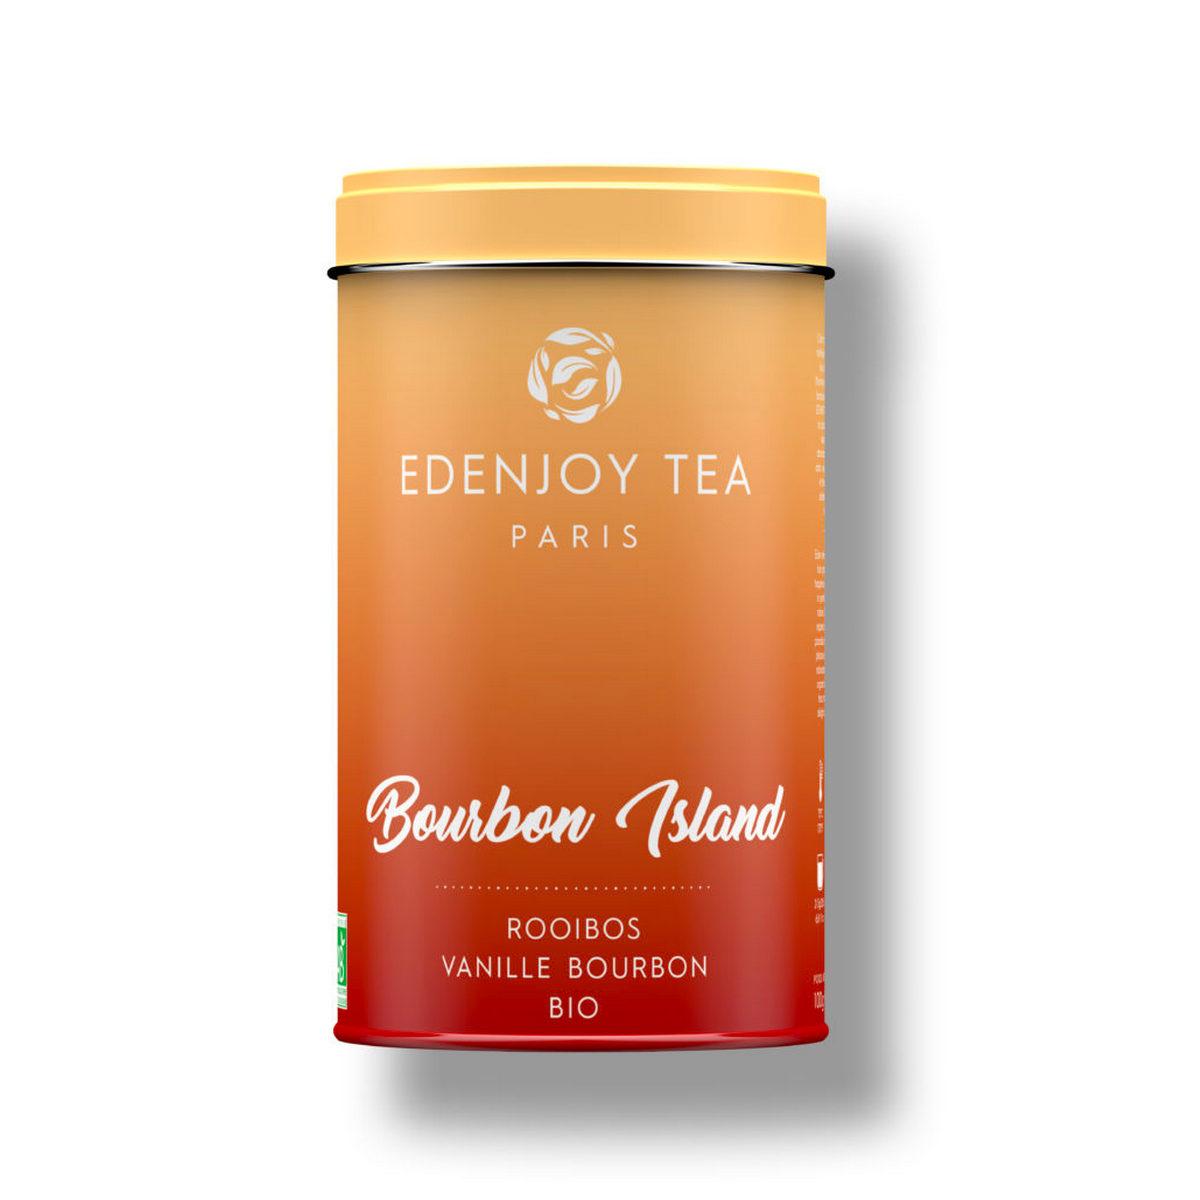 Rooibos bio vanille bourbon : Bourbon Island